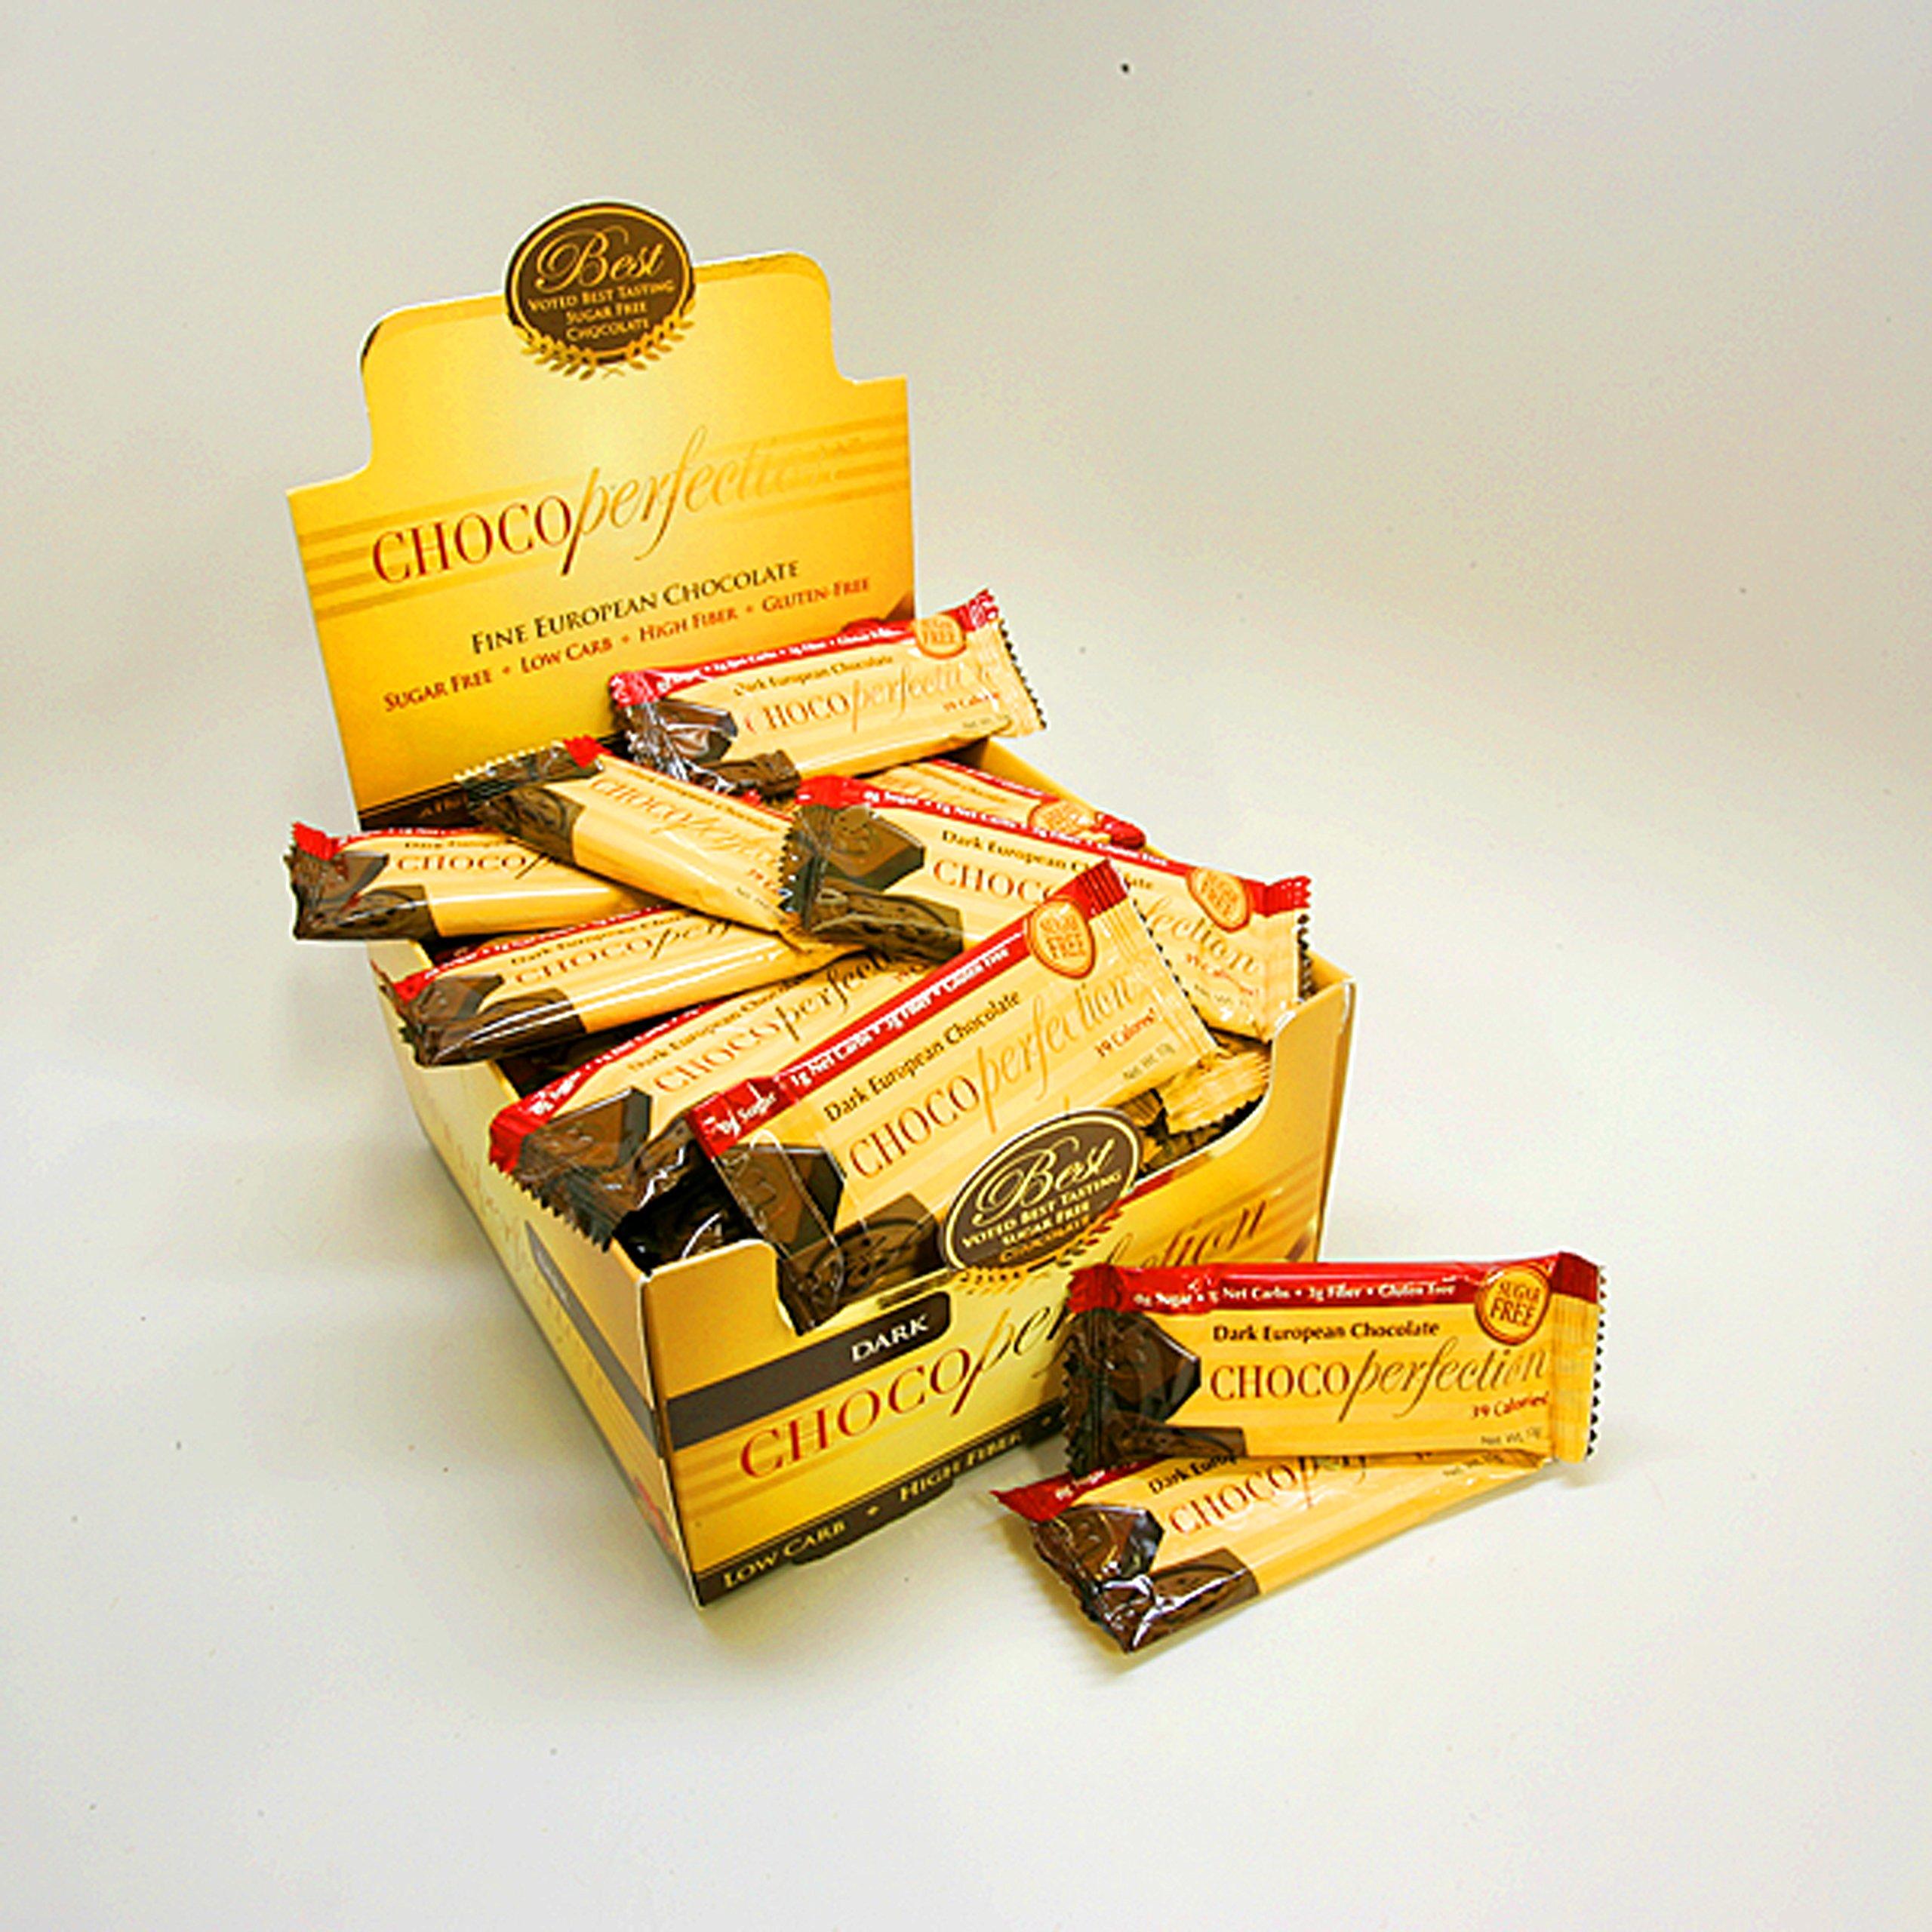 Sugar Free Dark Chocolate ChocoPerfection Sixty Dark Bars, 10g size by ChocoPerfection